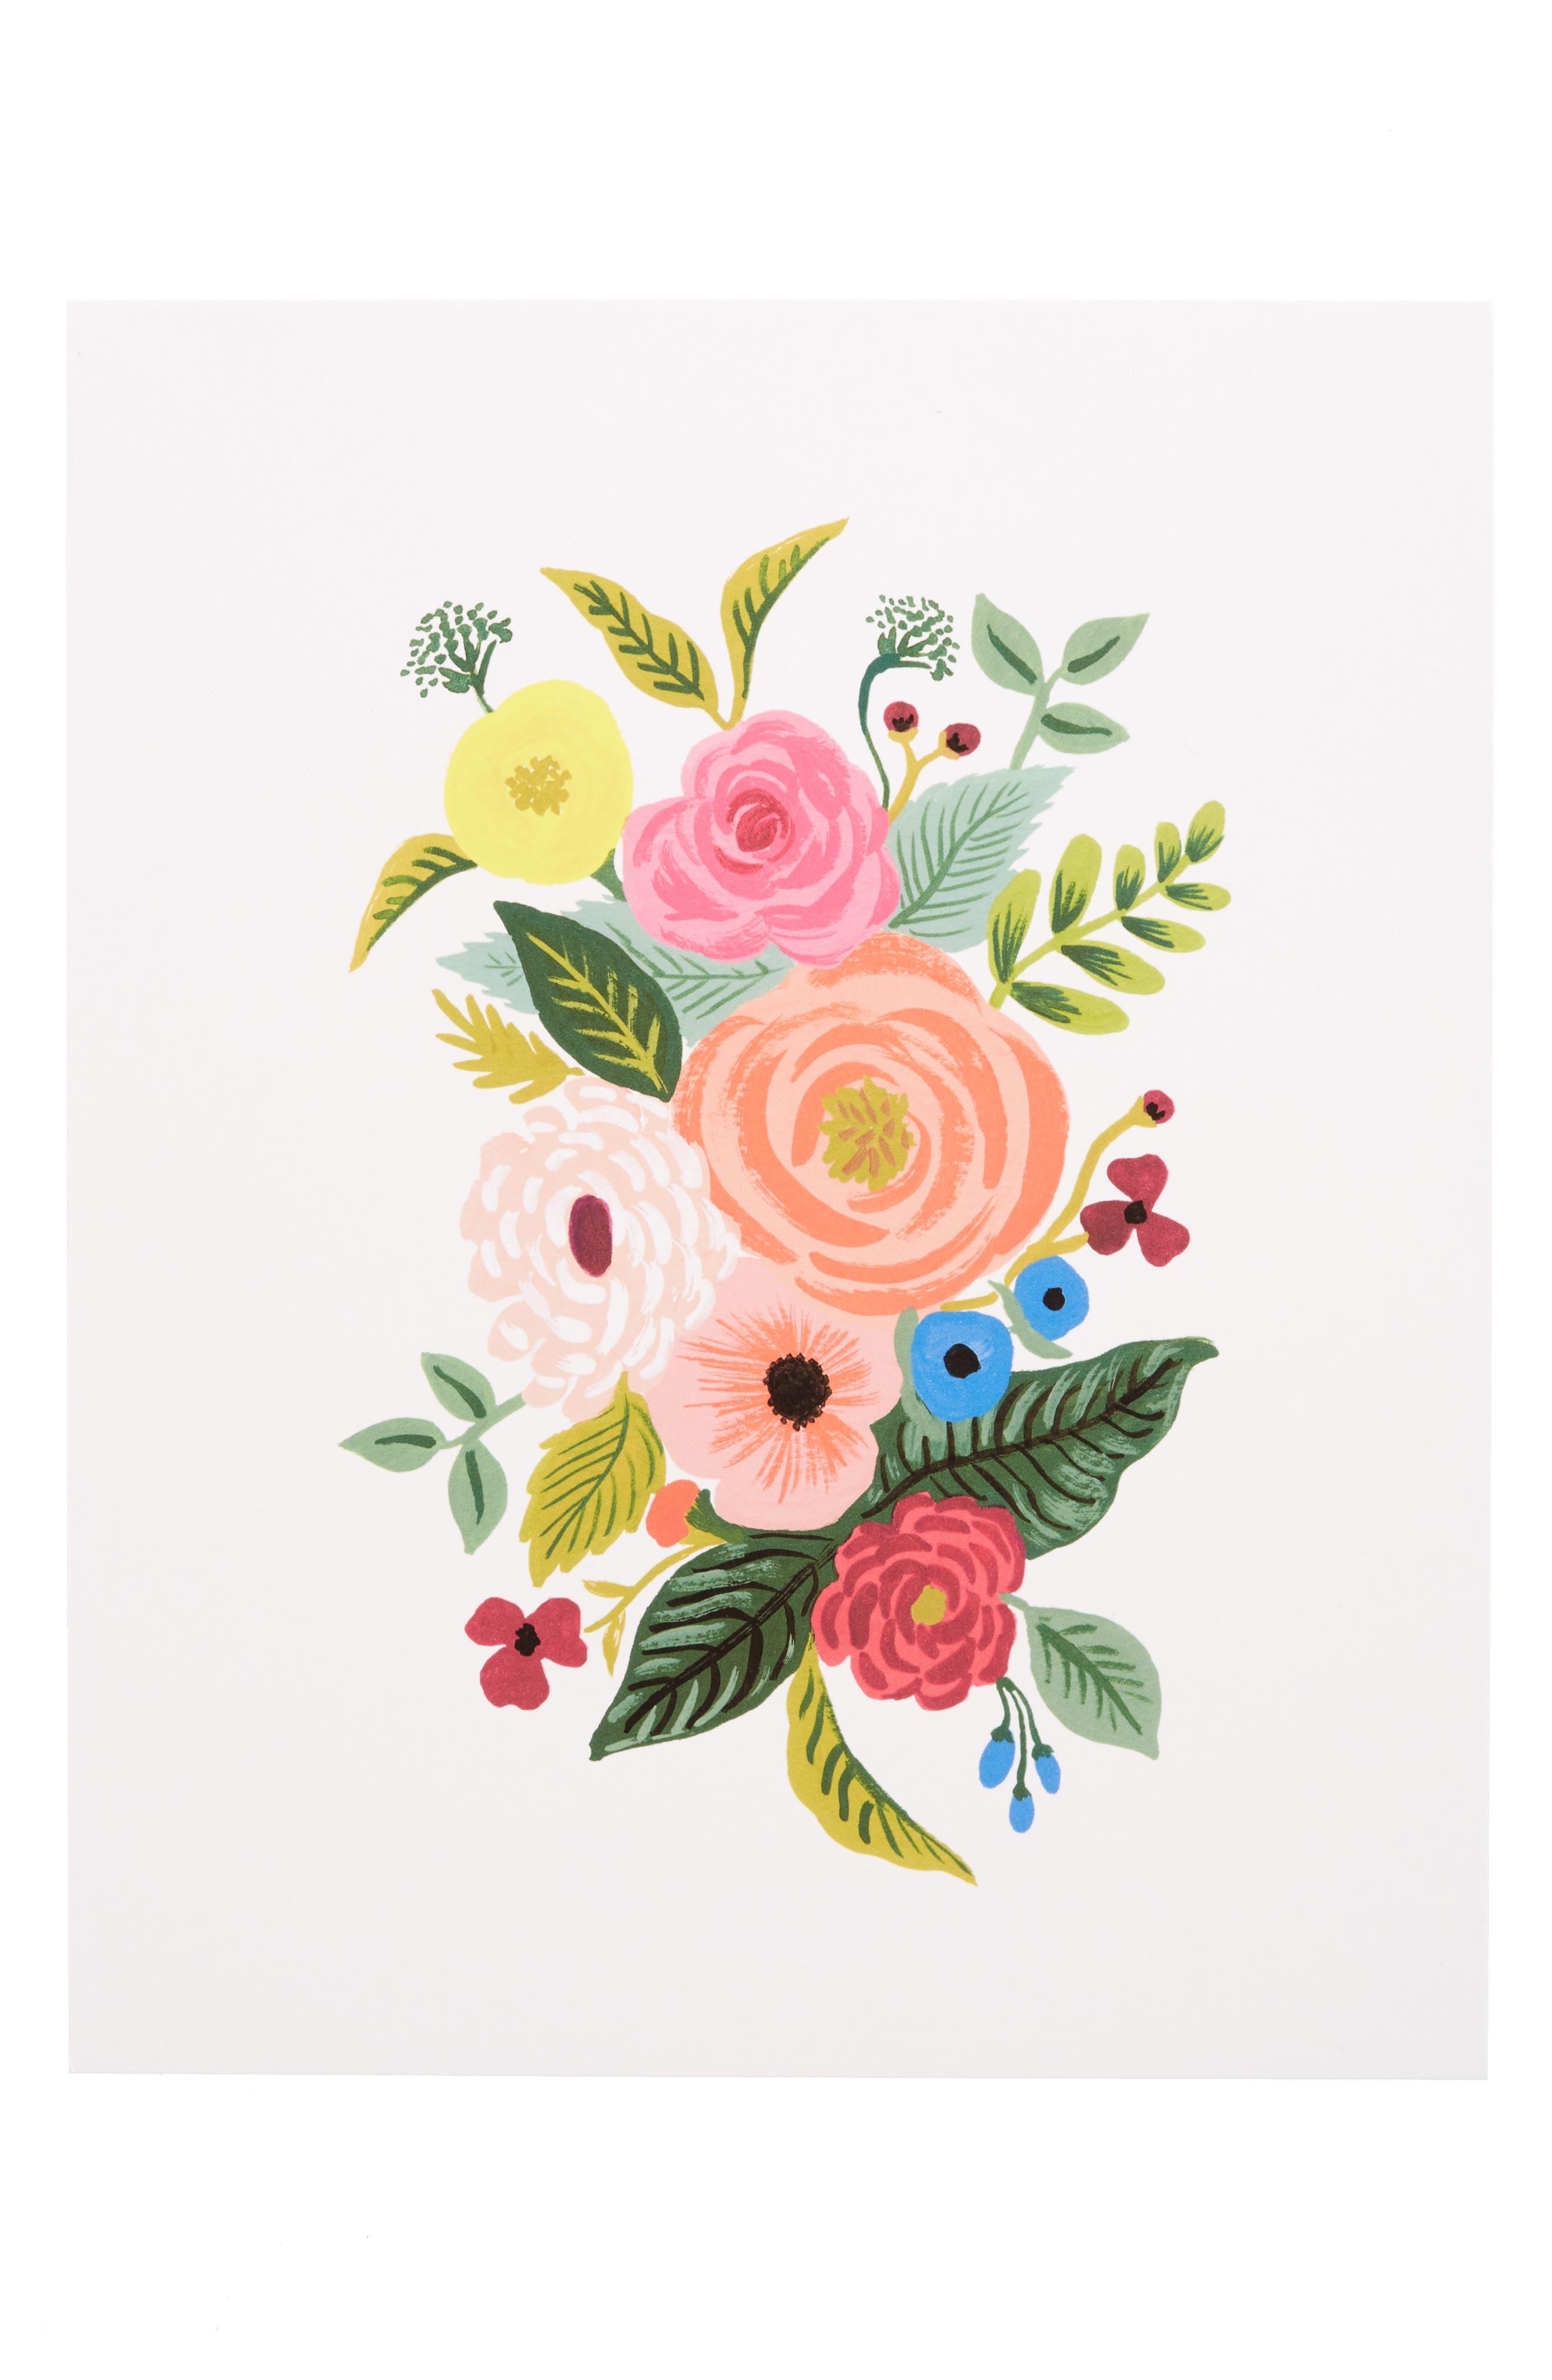 Alternate Image 1 Selected - Rifle Paper Co. Juliet Rose Art Print